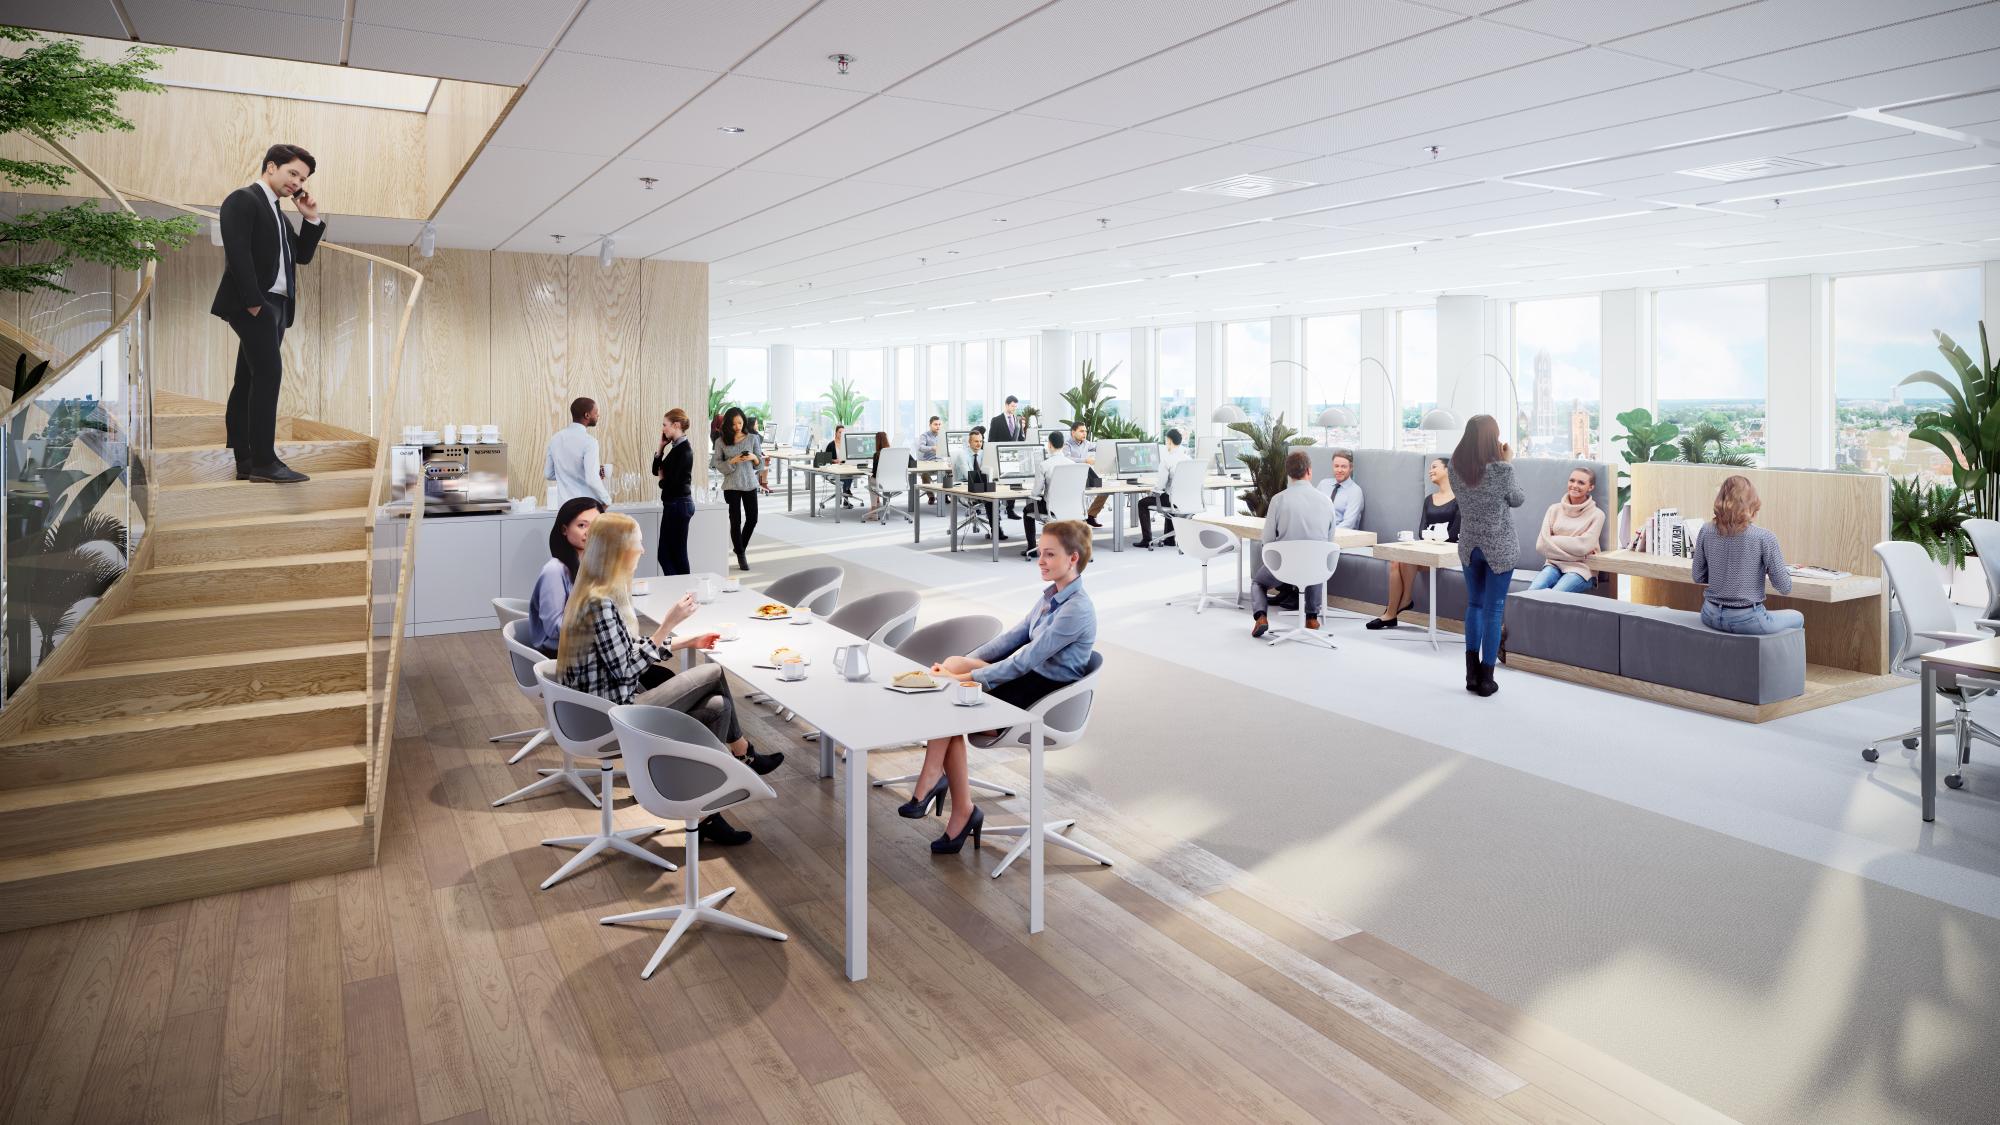 AG/APF verhuurt 1.350 m² in 'Central Park' aan adviesbureau Zanders